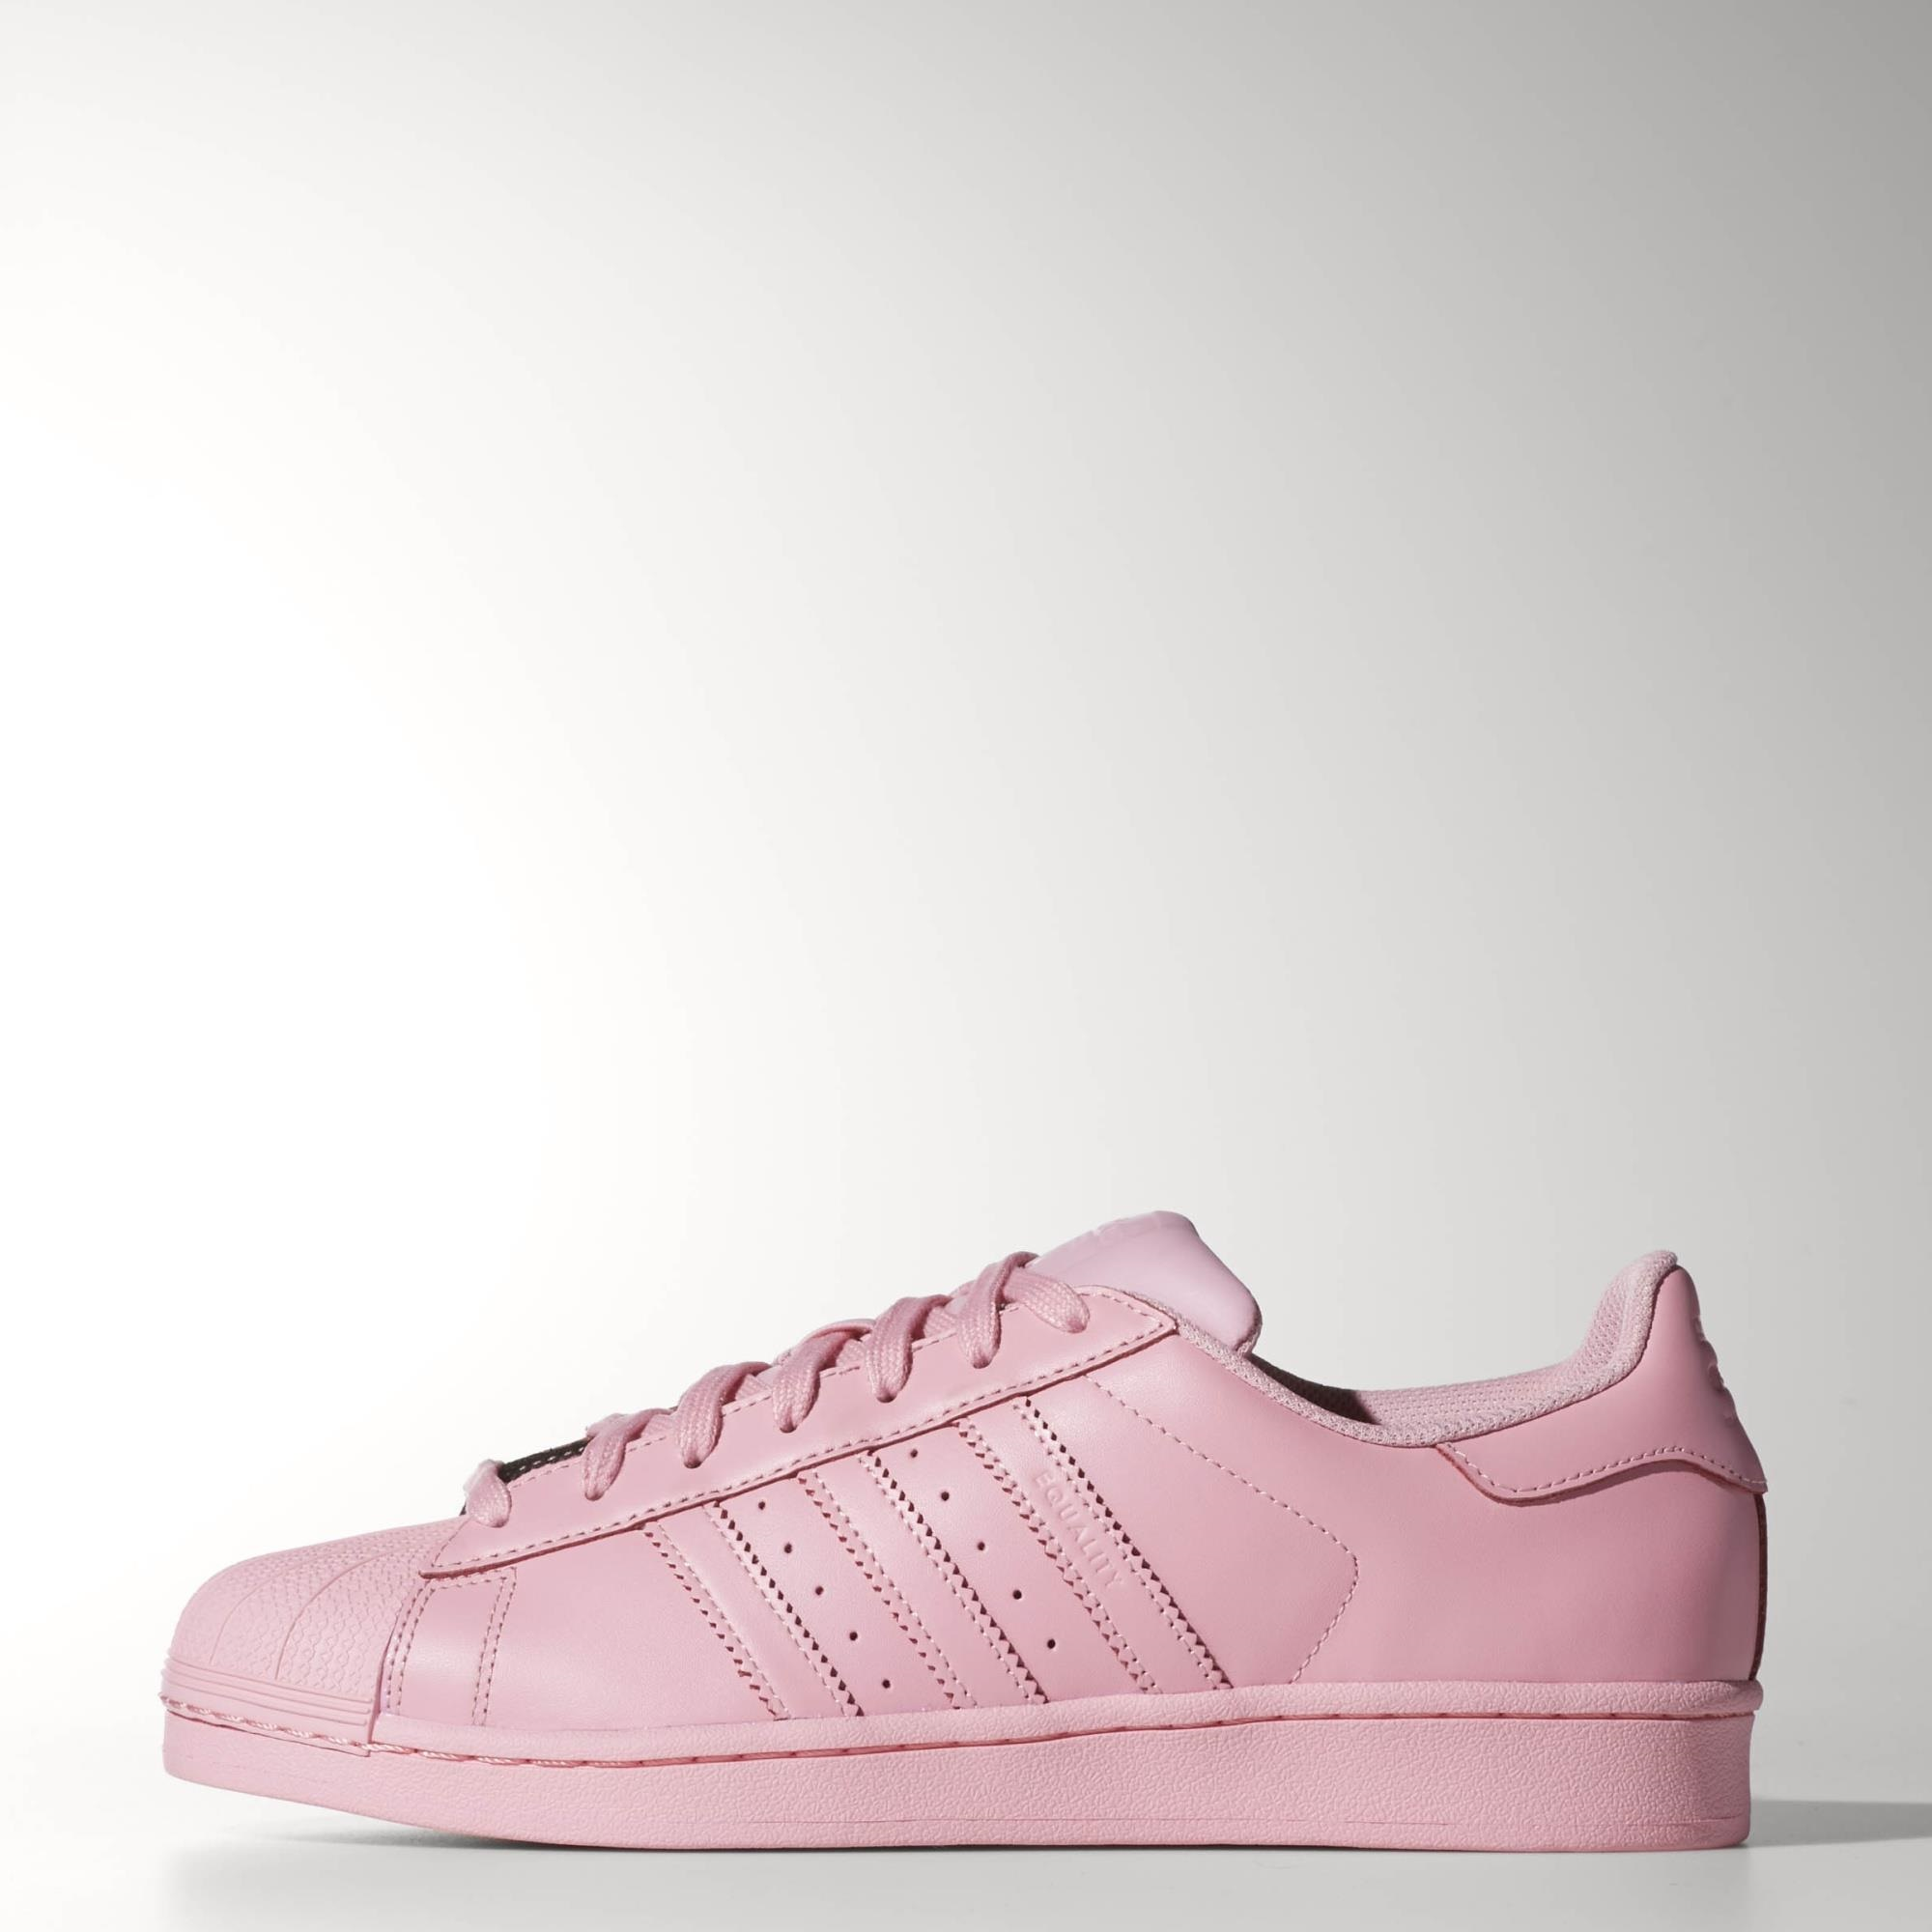 Adidas Superstar Pink Multicolor